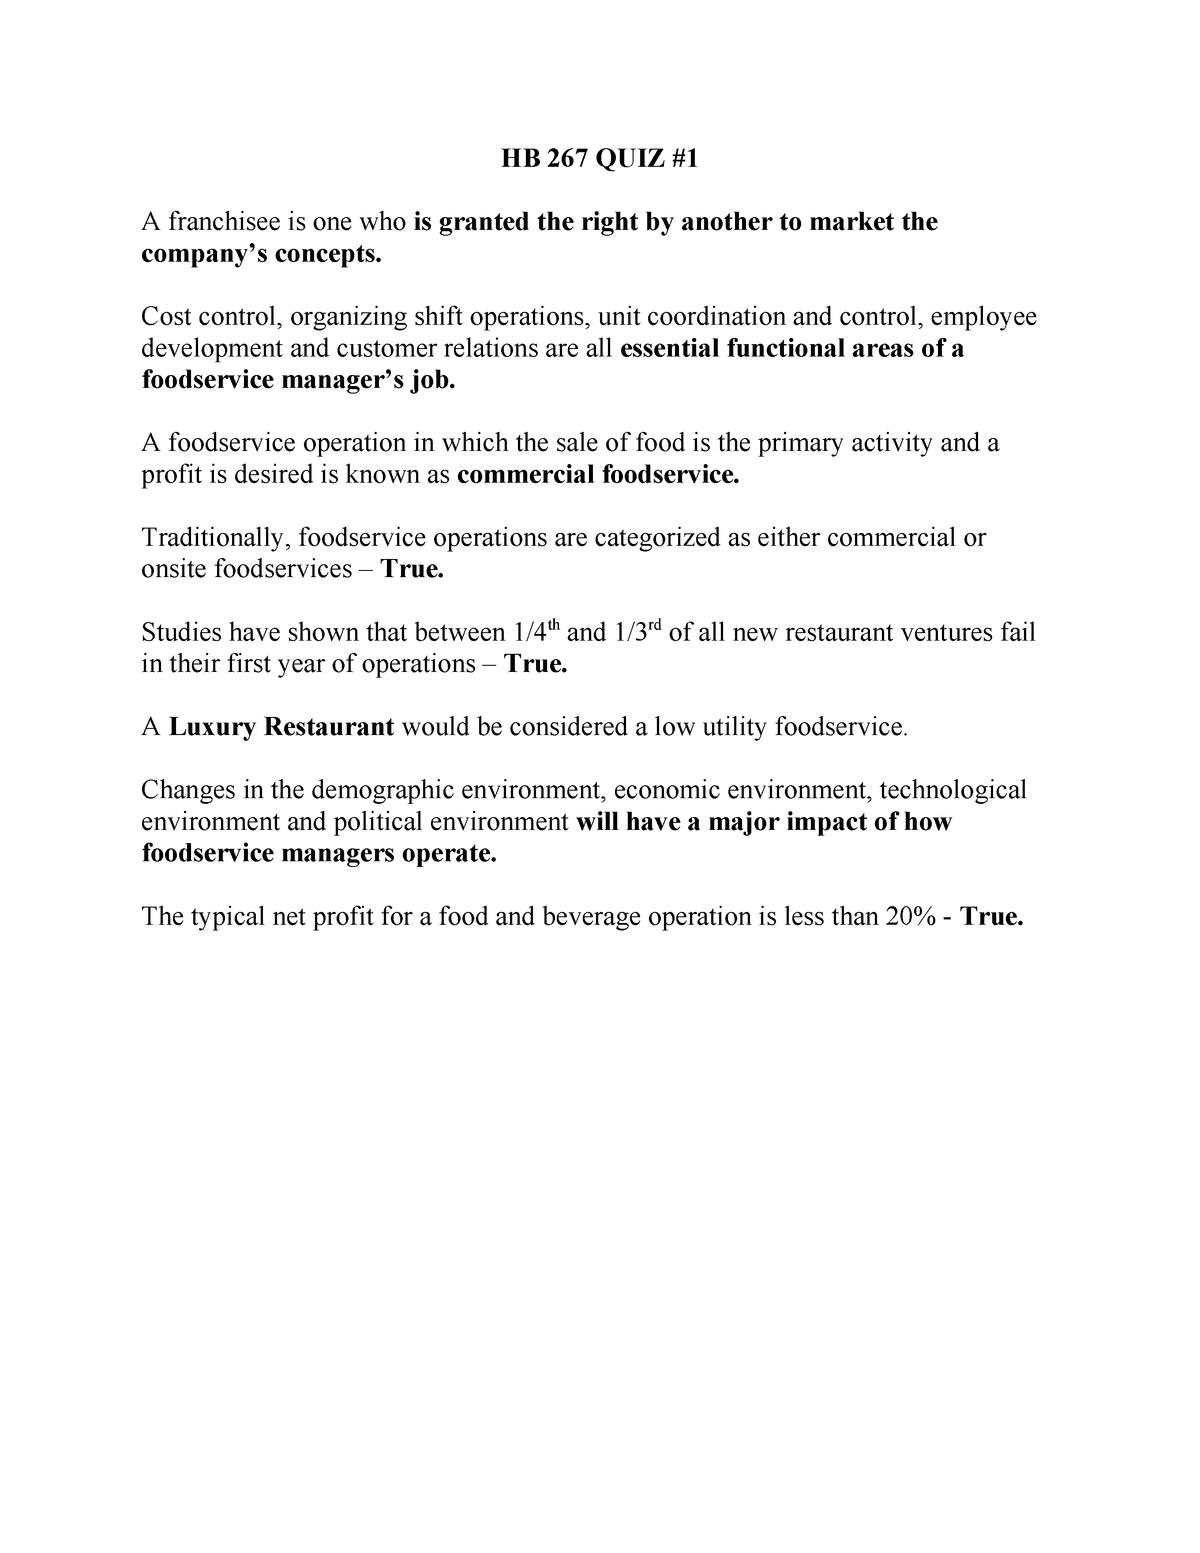 Exam 2015 - HB 267: Food And Beverage Management - StuDocu